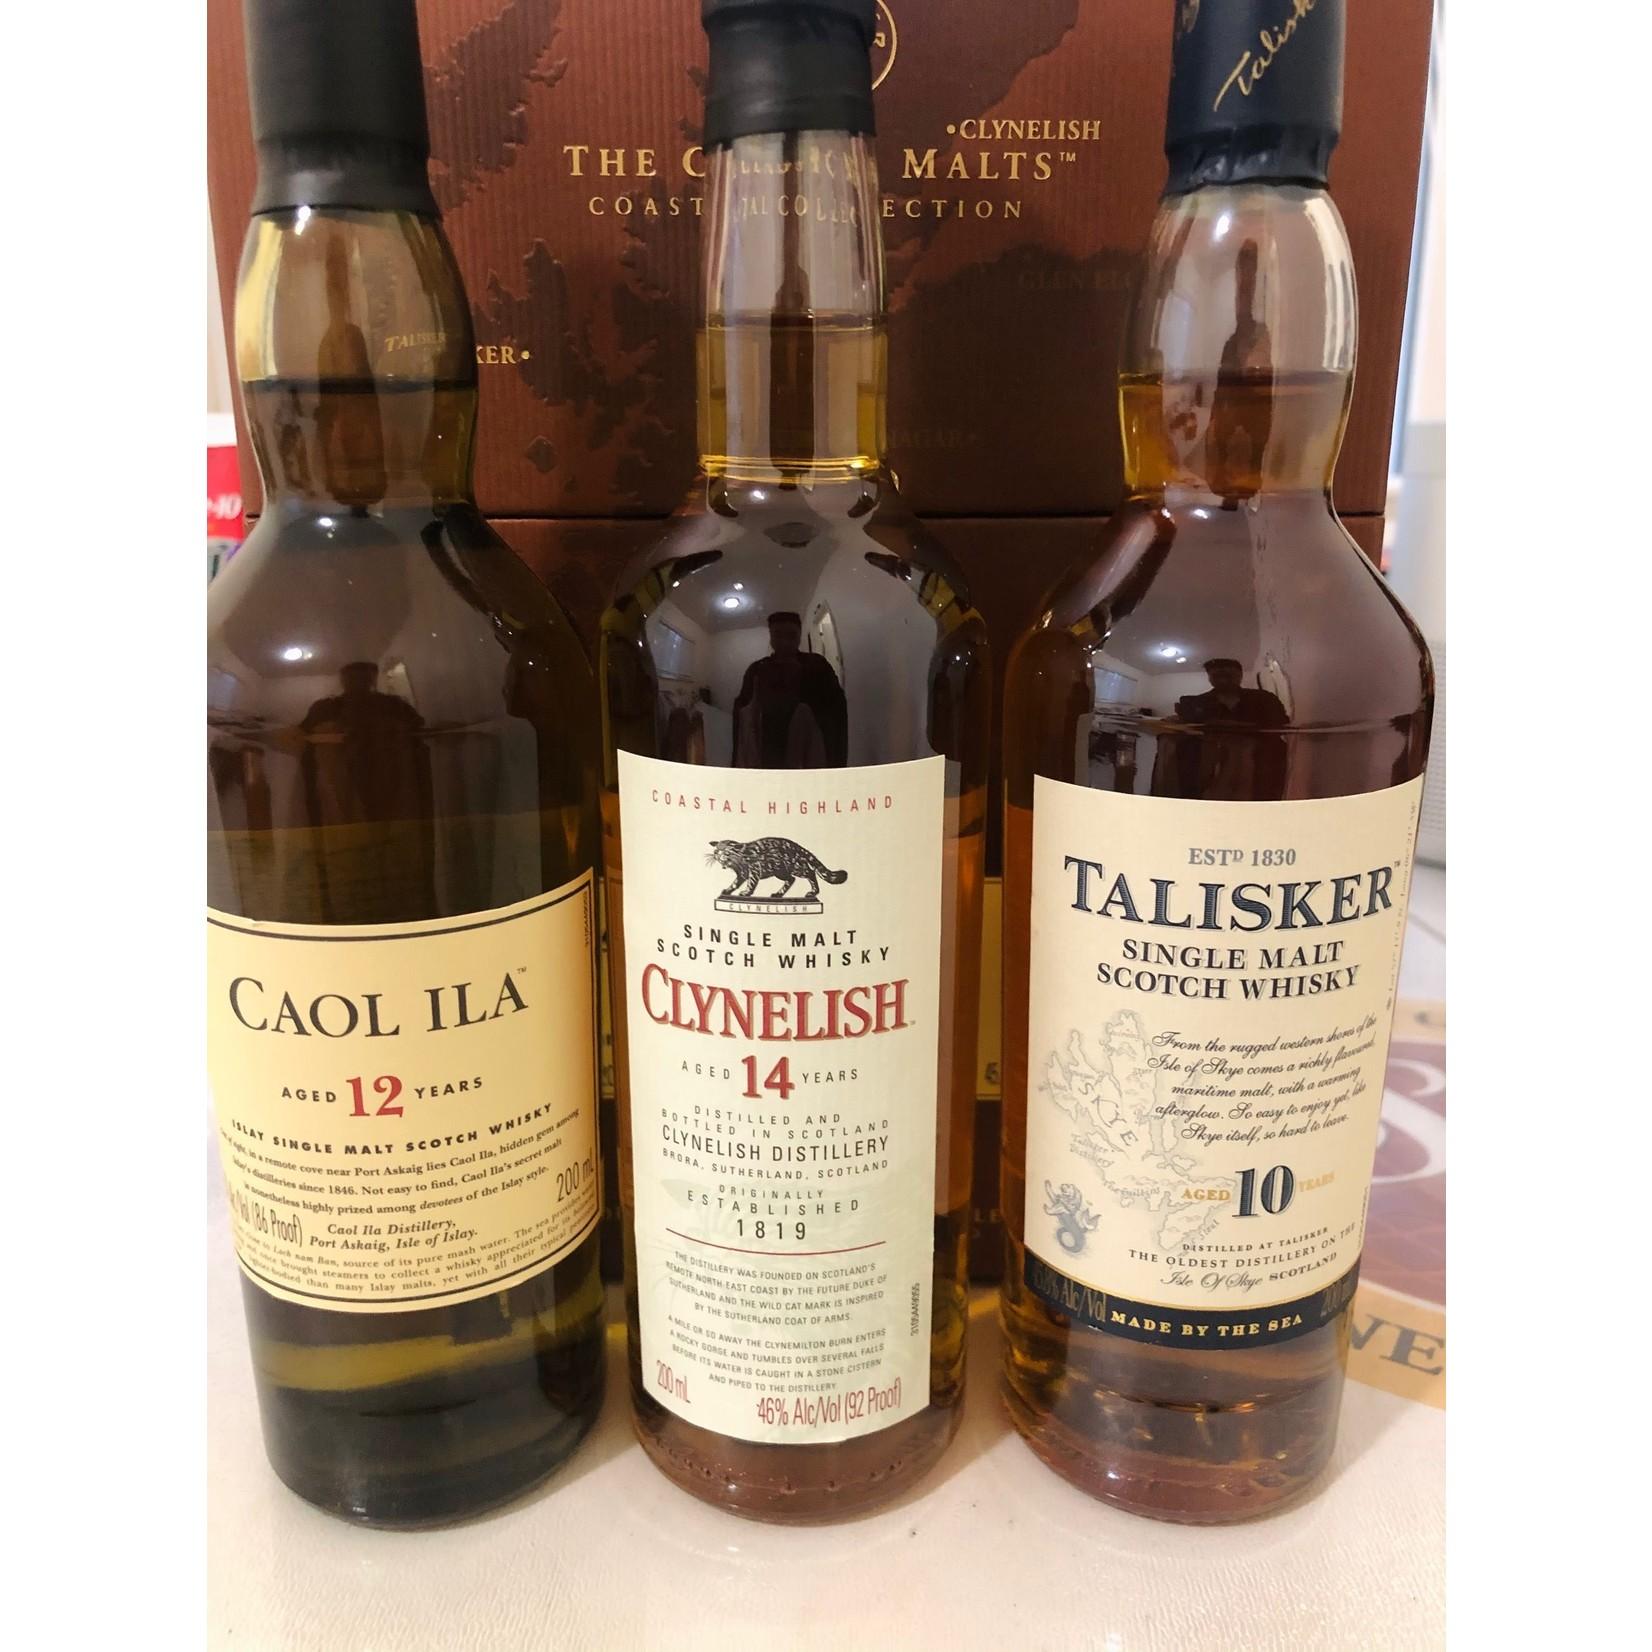 Spirits The Classic Malts Single Malt Scotch Coastal Collection Combo 1 each Talisker 10 Year, Caol Ila 12 Year, Clynelish 14 Year 200ml 3pack